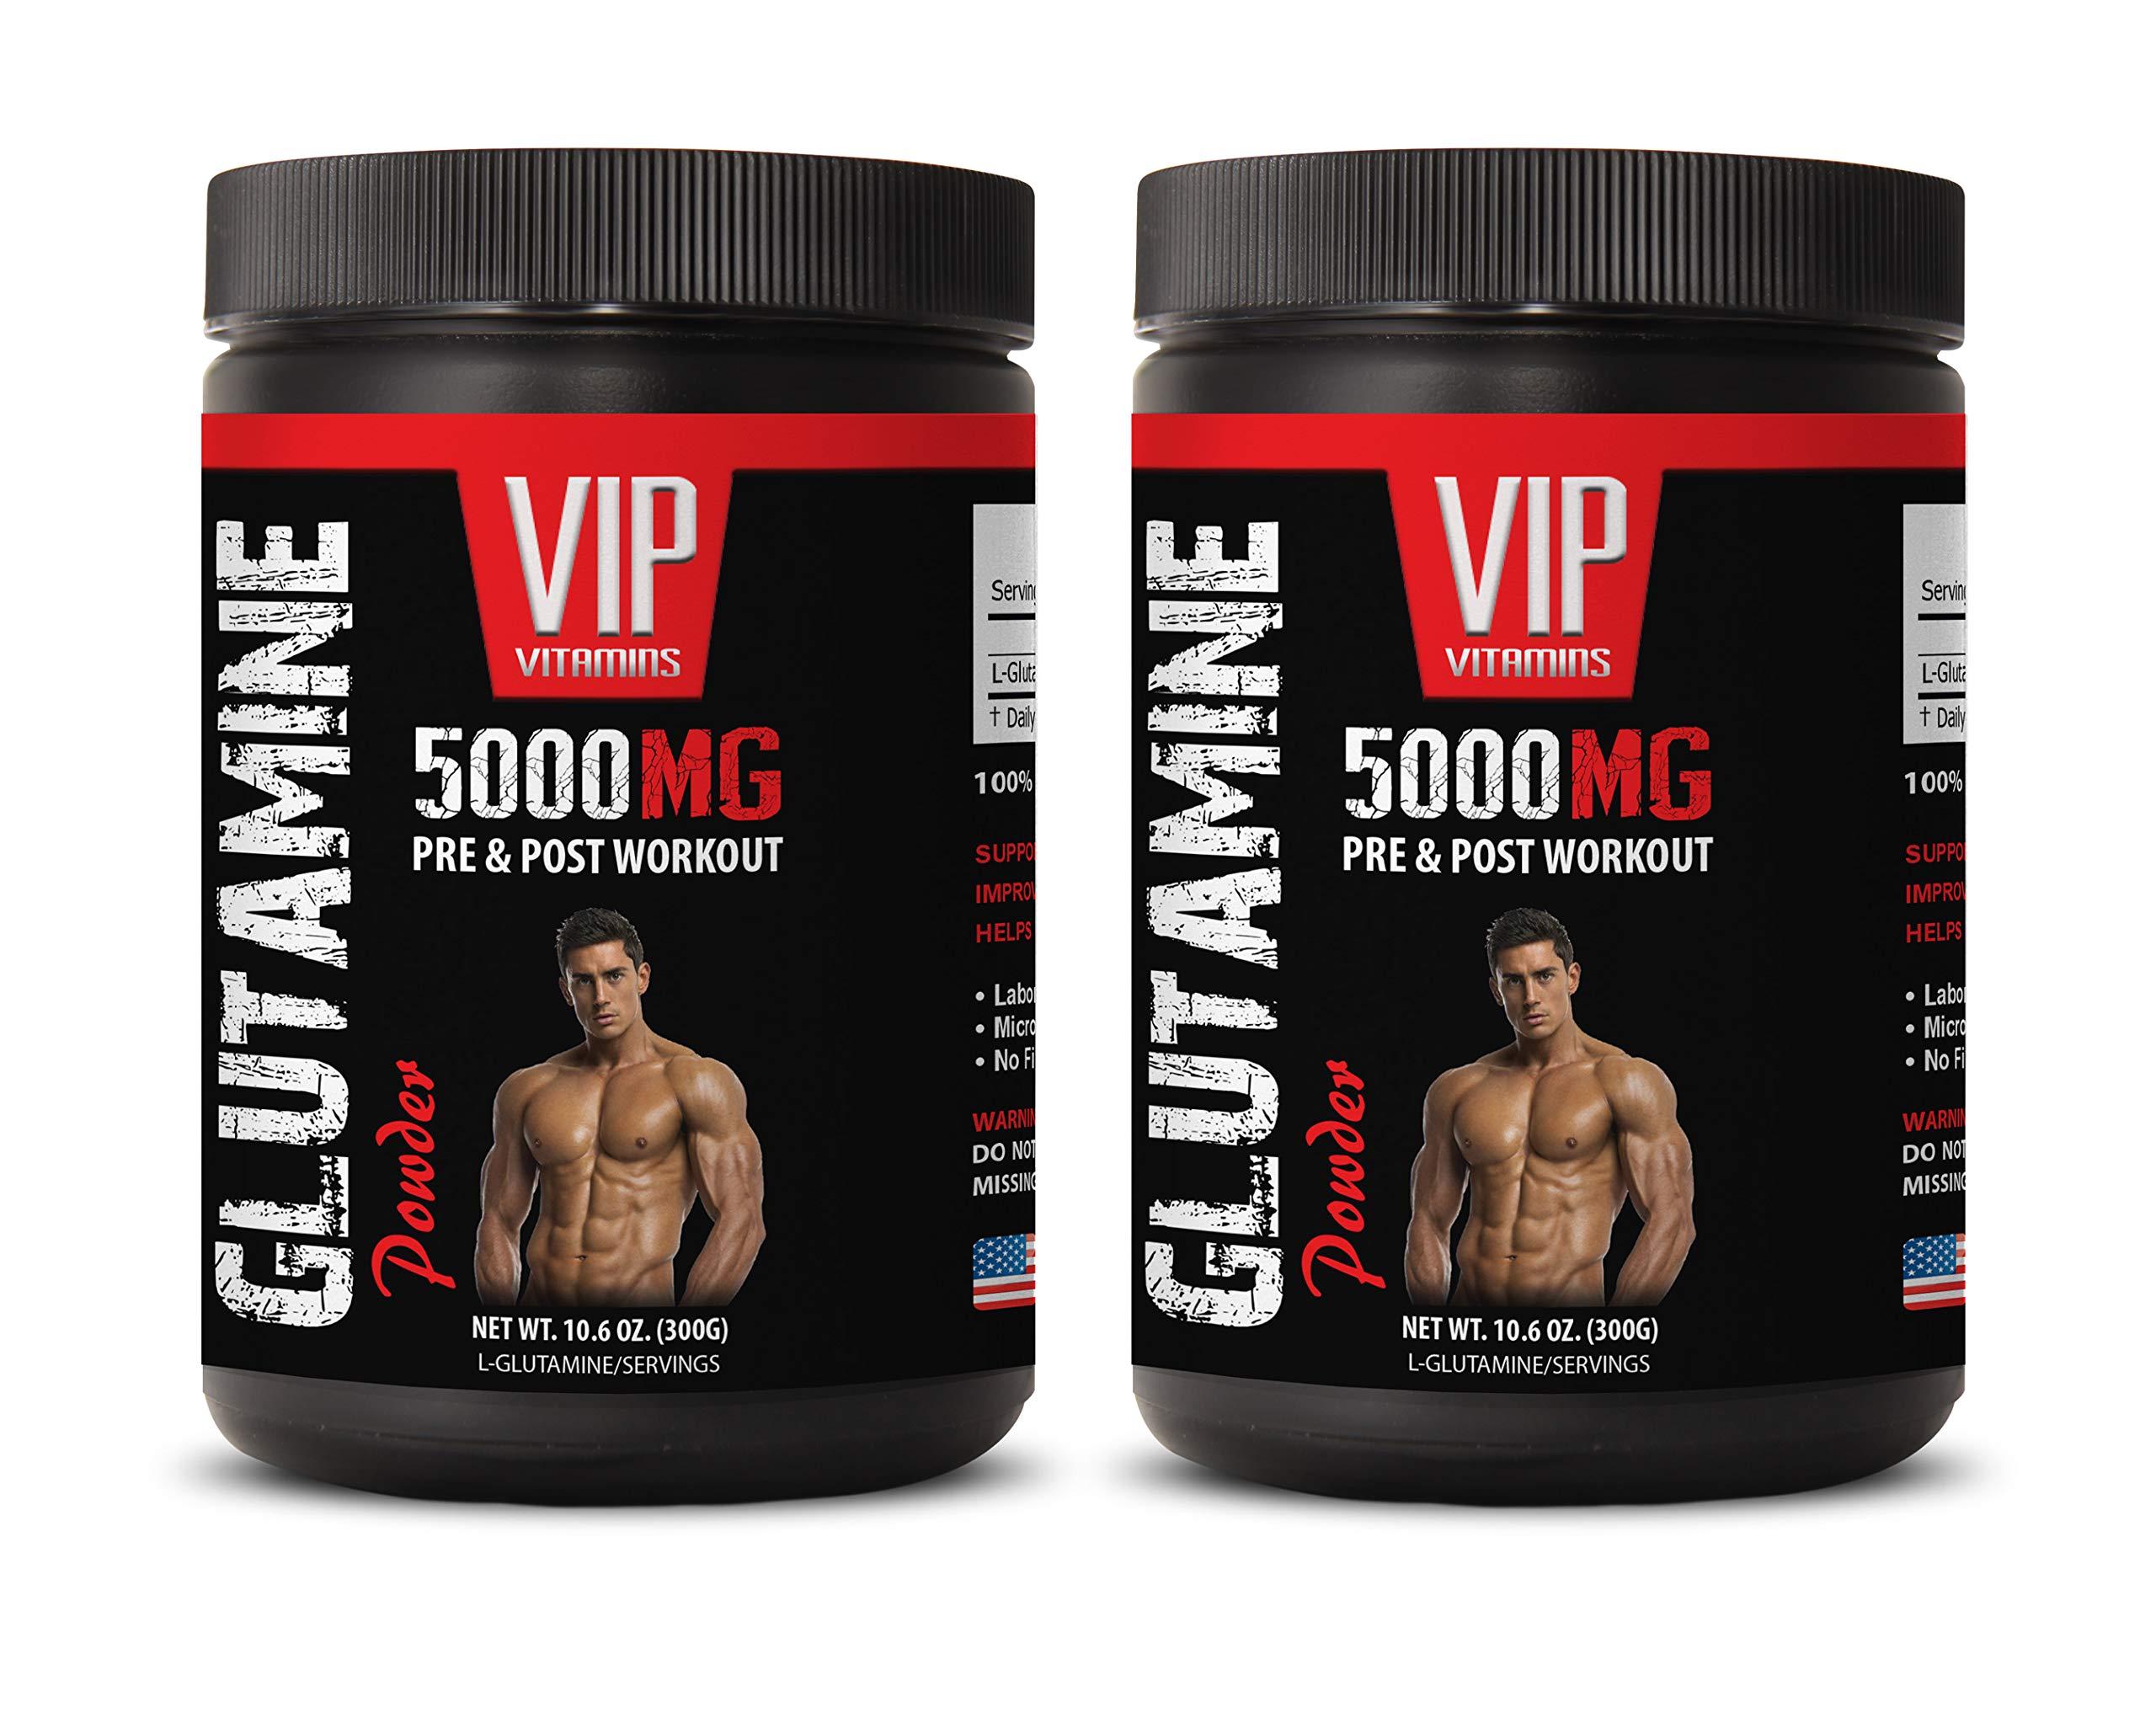 Workout Supplements for Women - GLUTAMINE Powder 5000MG - PRE & Post Workout - l-glutamine Gluten Free - 2 Cans 600 Grams